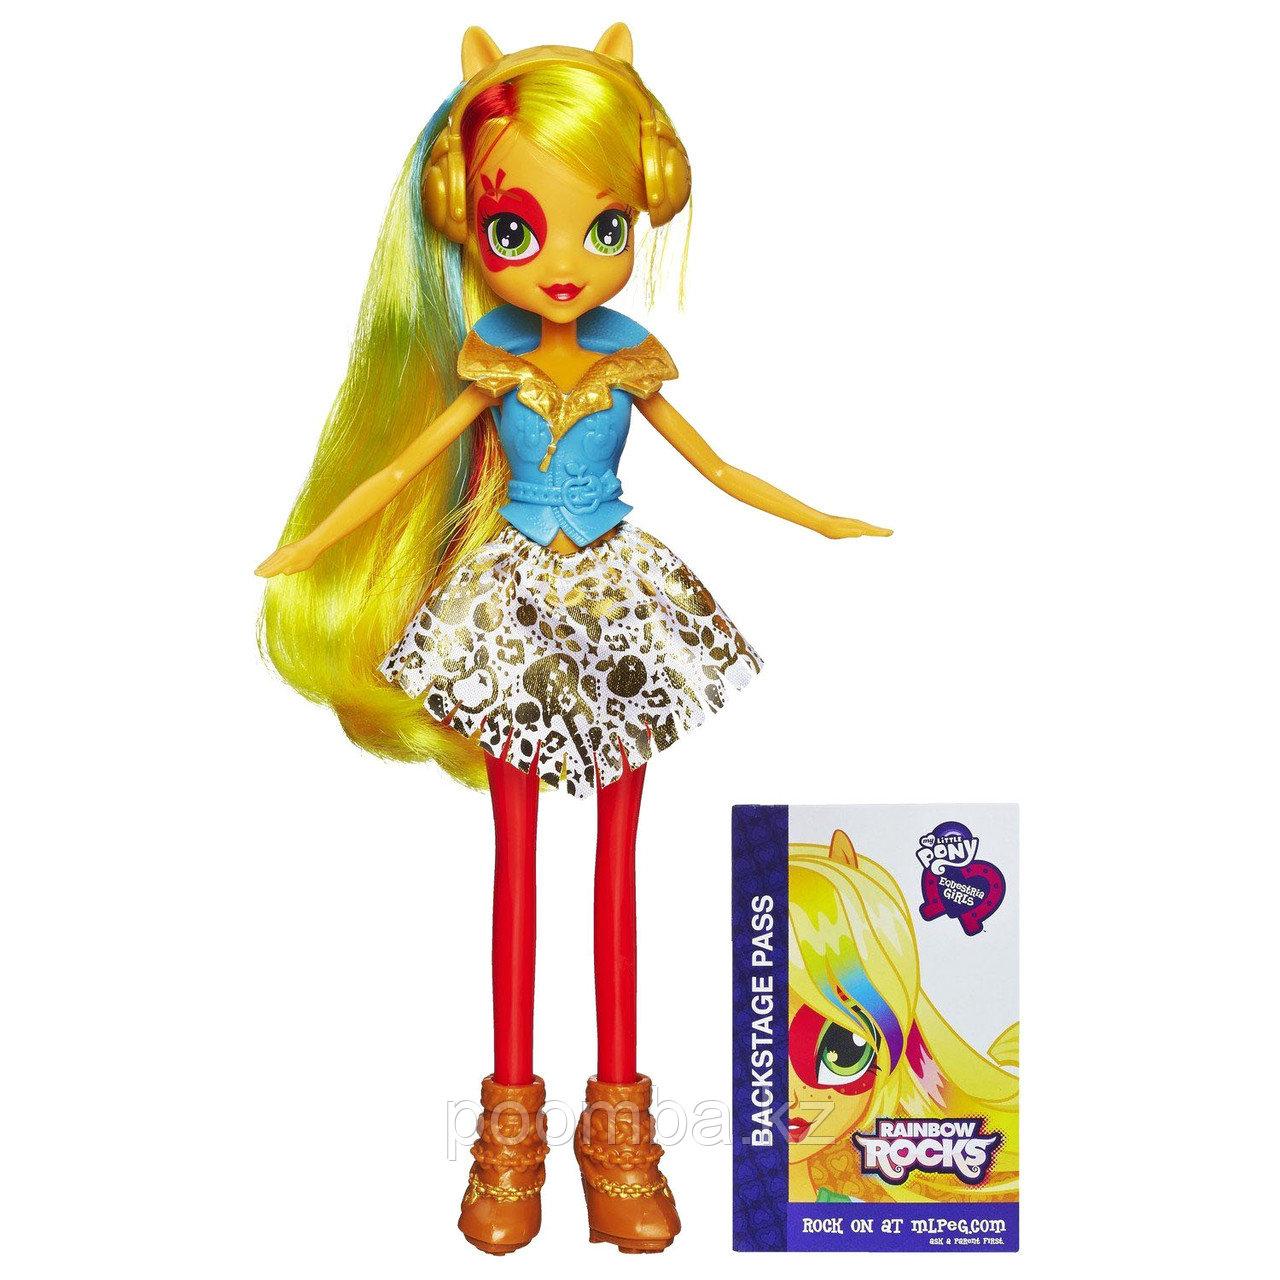 Кукла Apple Jack, из серии 'Радужный рок', My Little Pony Equestria Girls (Девушки Эквестрии), Hasbro